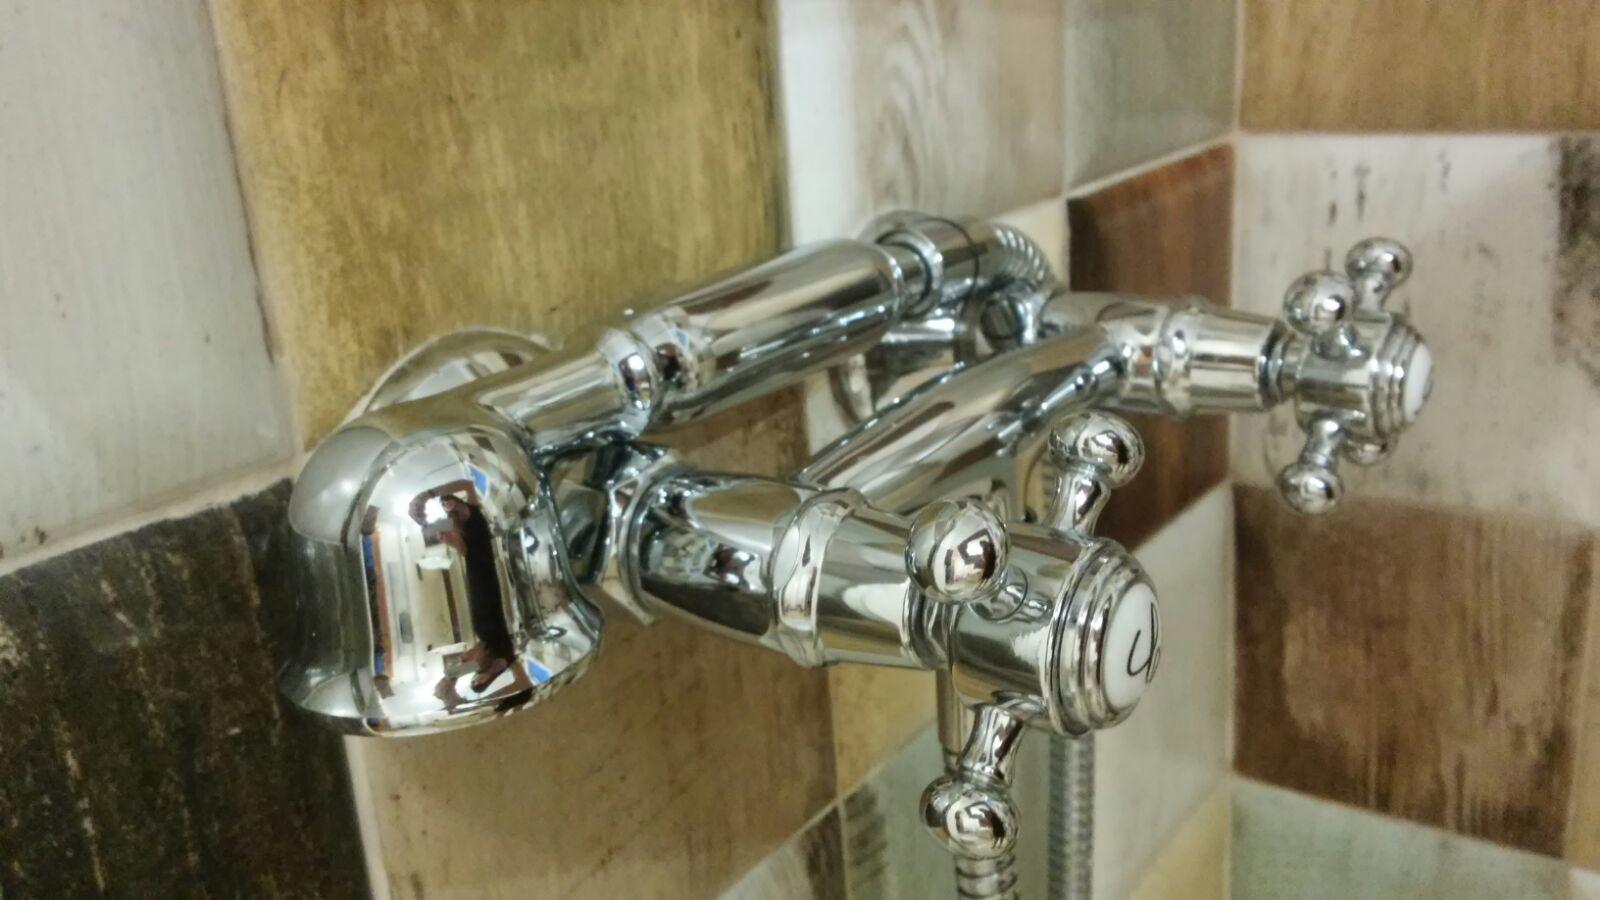 Instalación de fontaneria